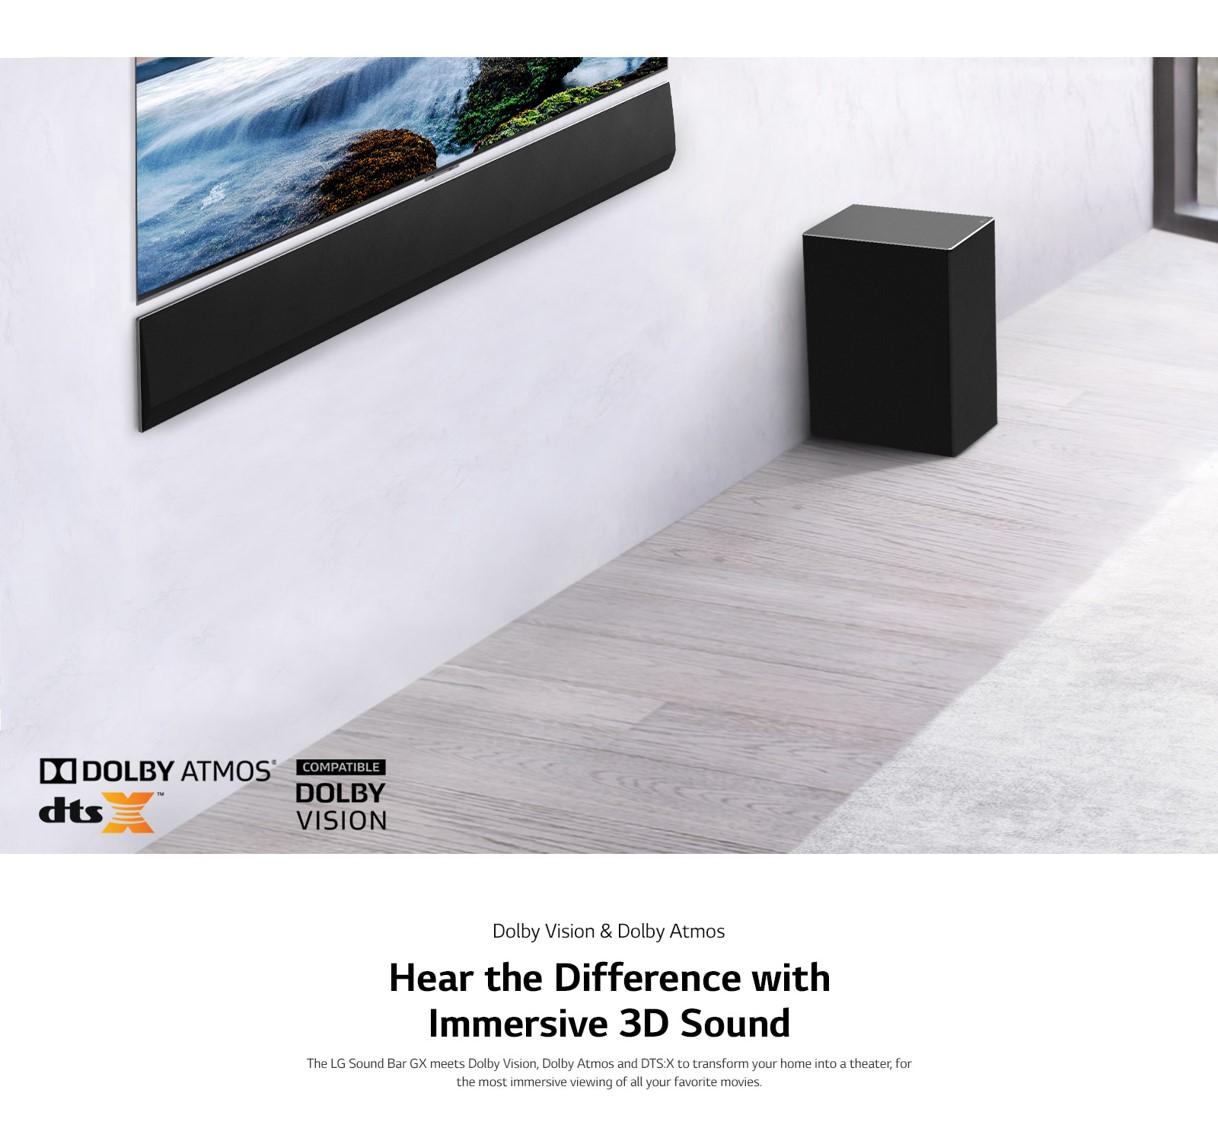 LG's GX Soundbar is placed under LG GX Gallery OLED series TV in a modern living room